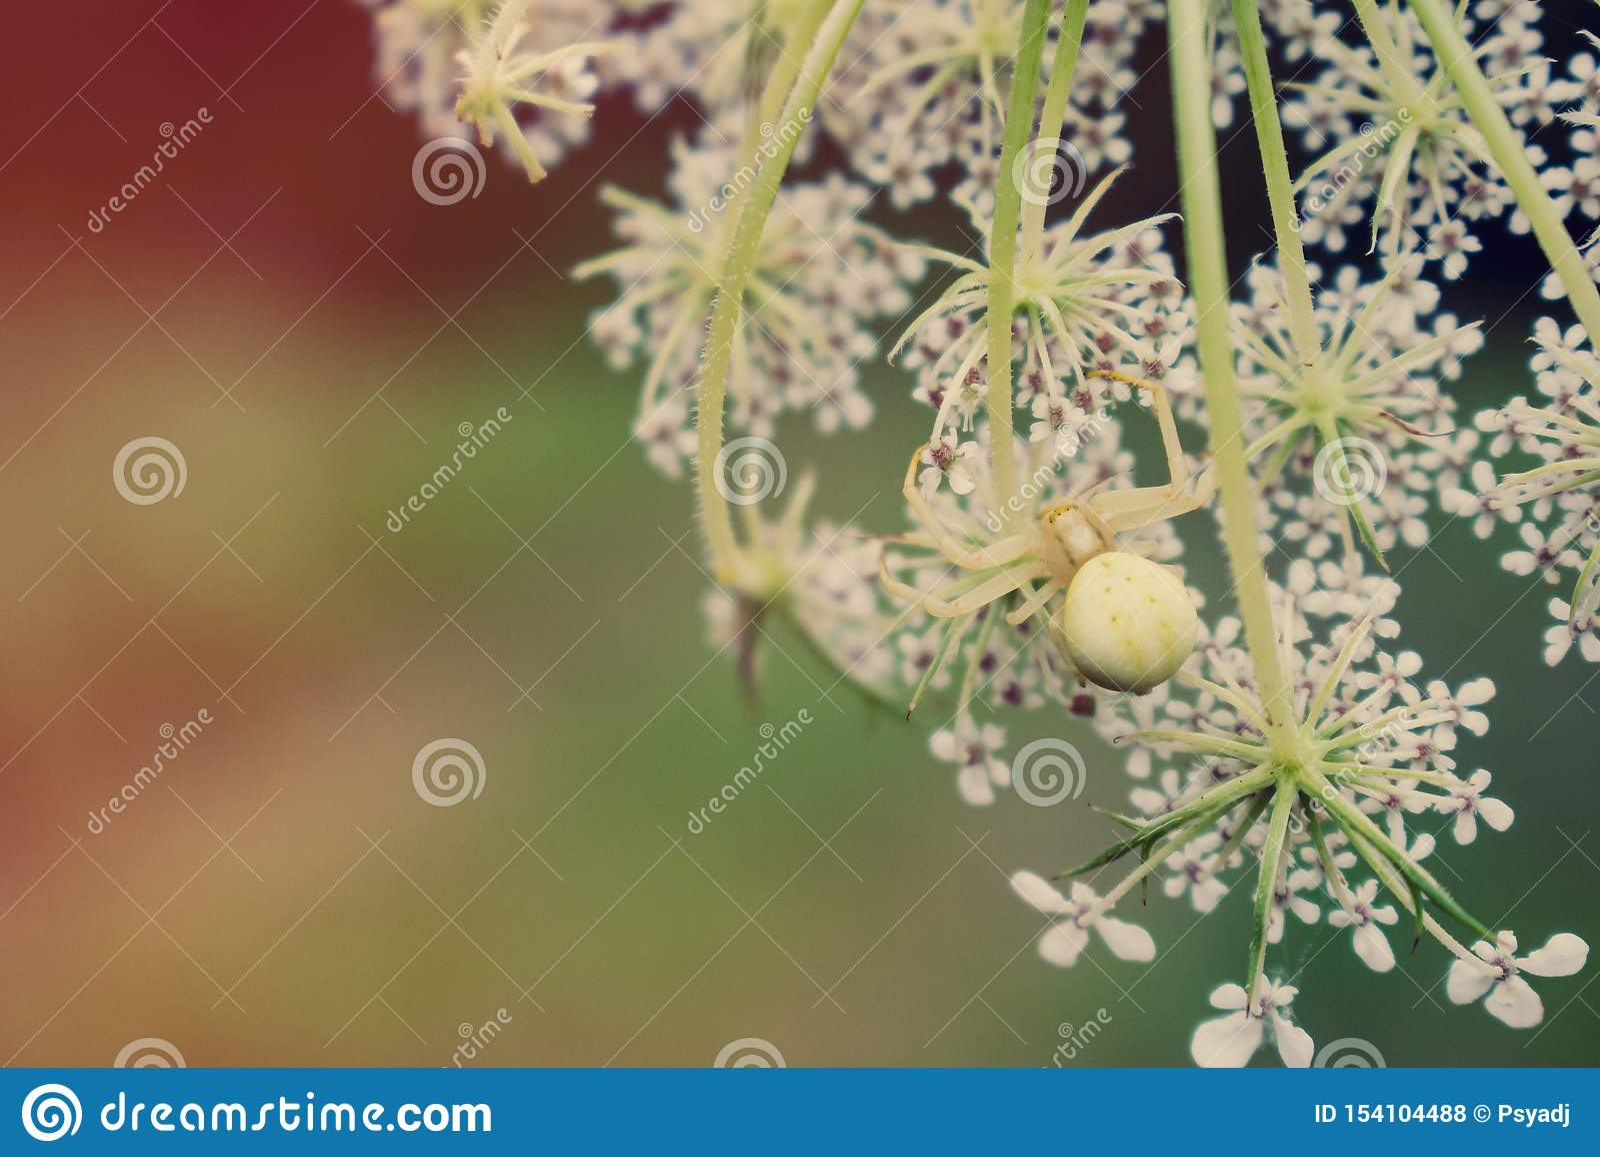 Krabspin op witte bloem